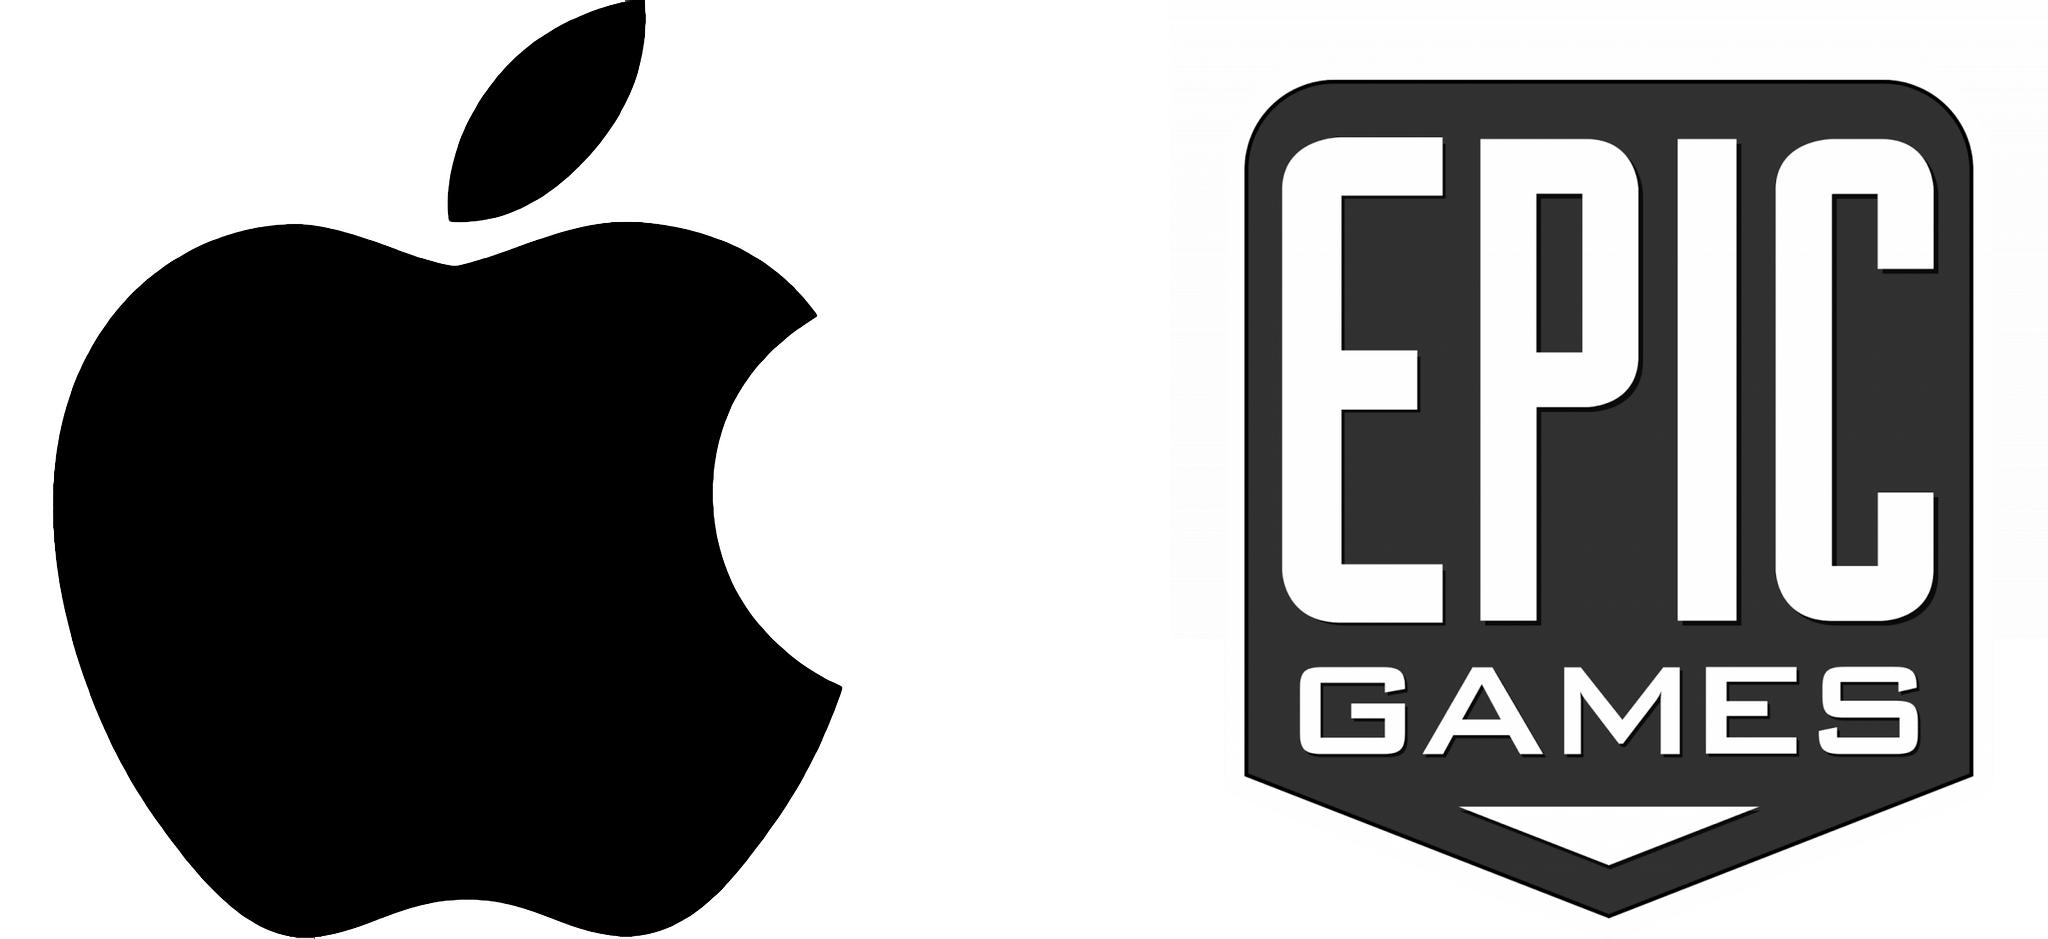 Epic Versus Apple: The MacStories Overview